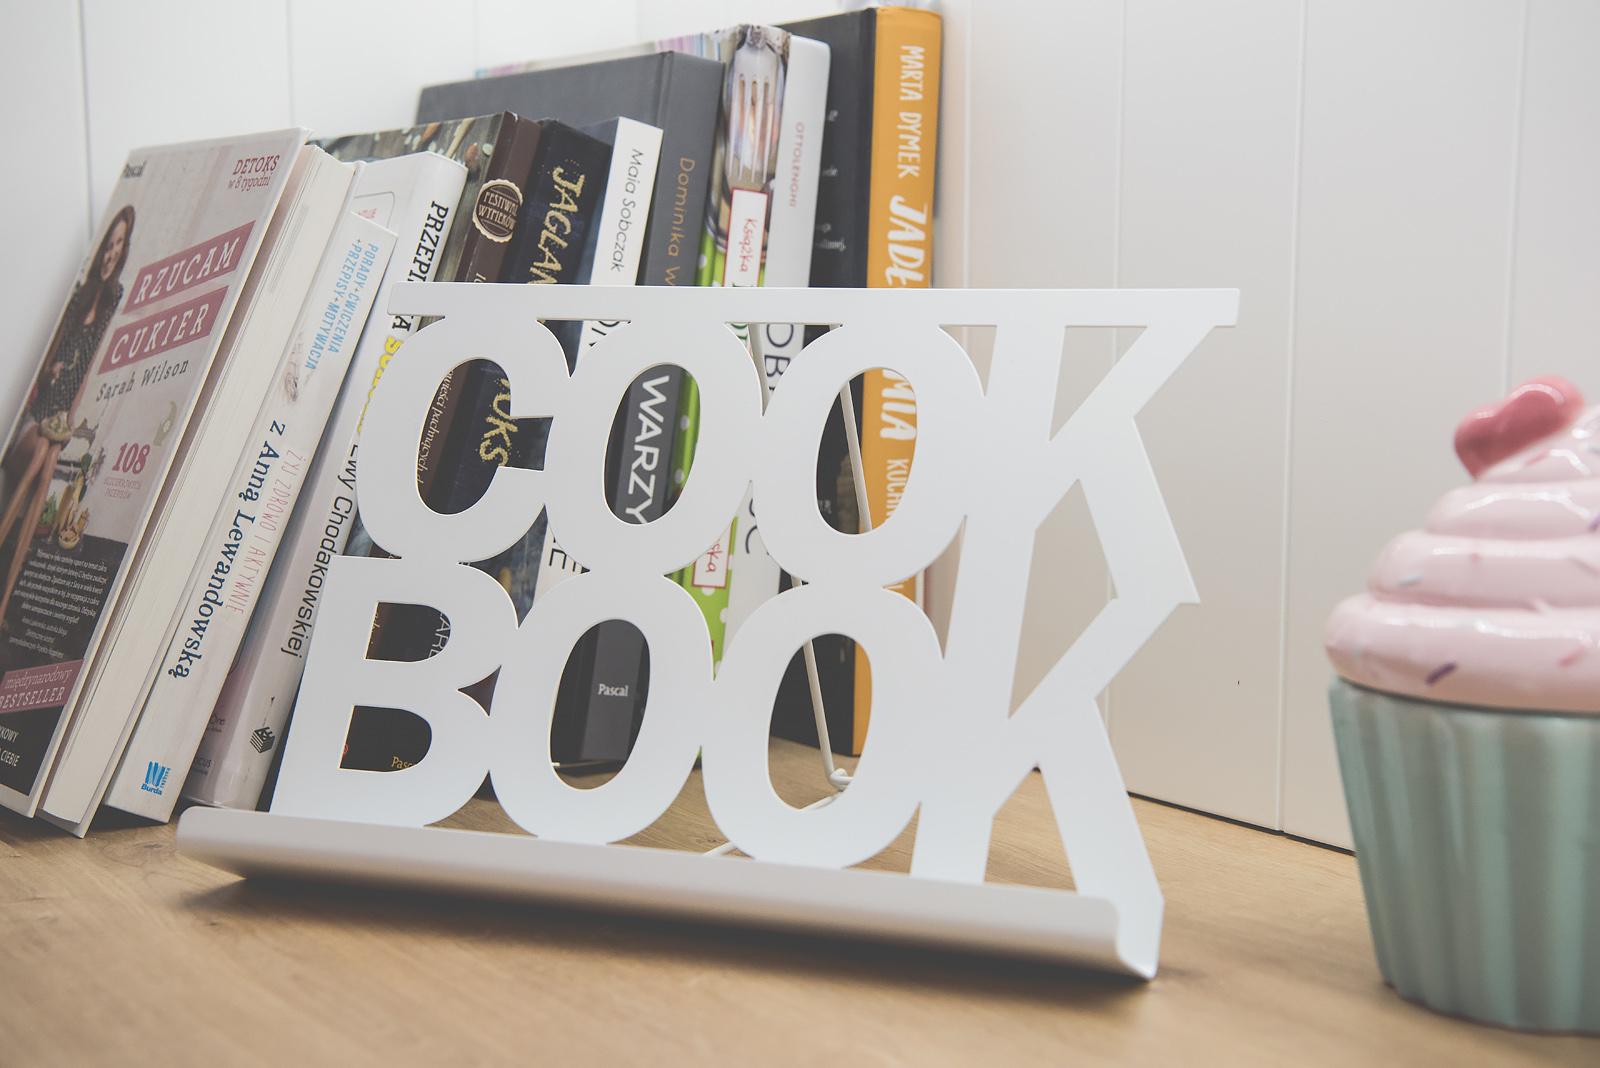 podstawka-pod-ksiazke-kucharska